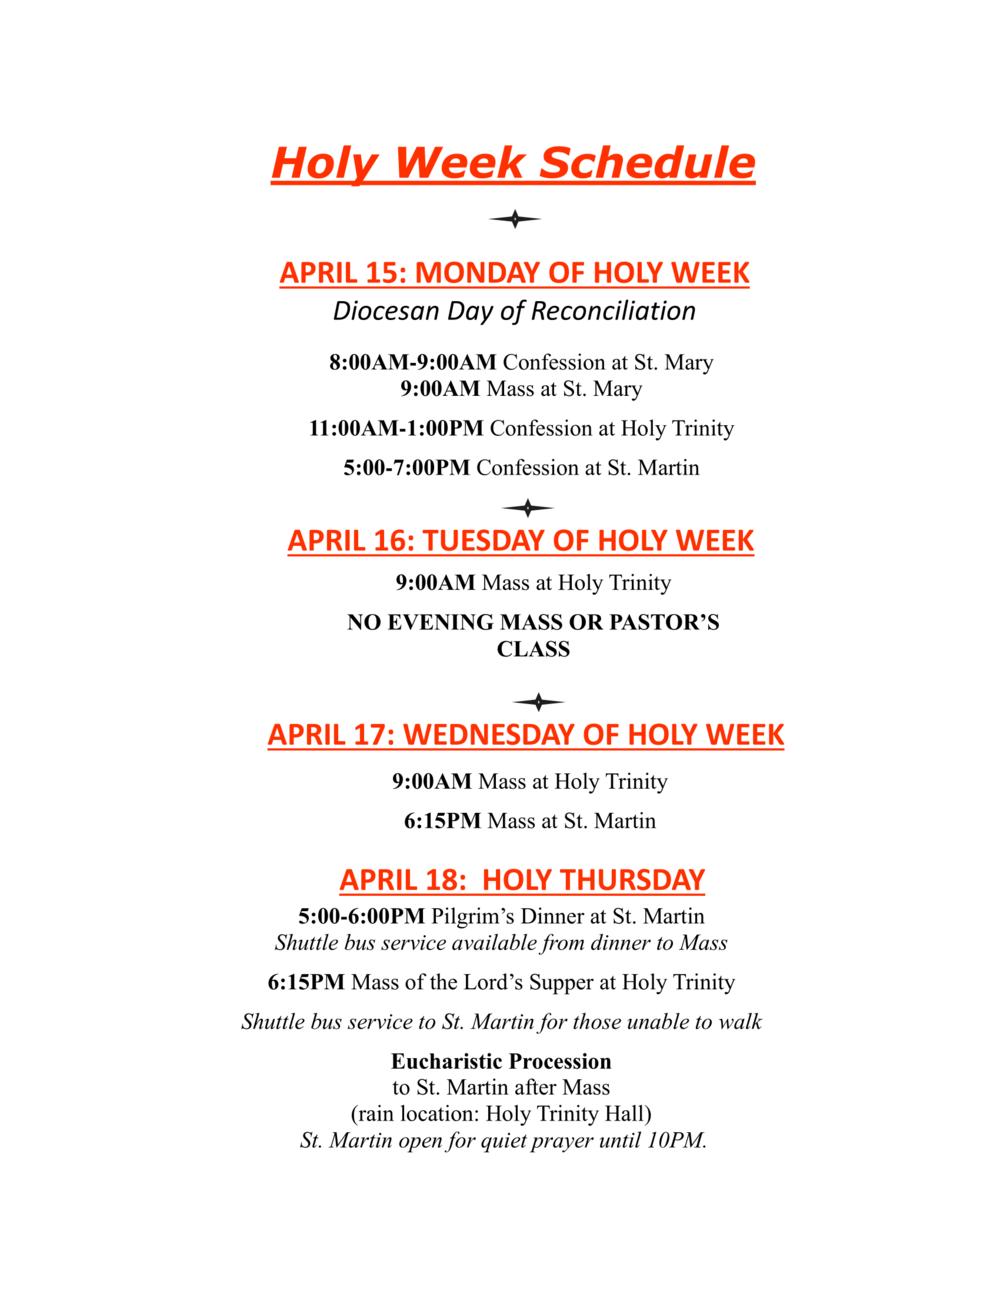 Holy Week Schedule-1.png